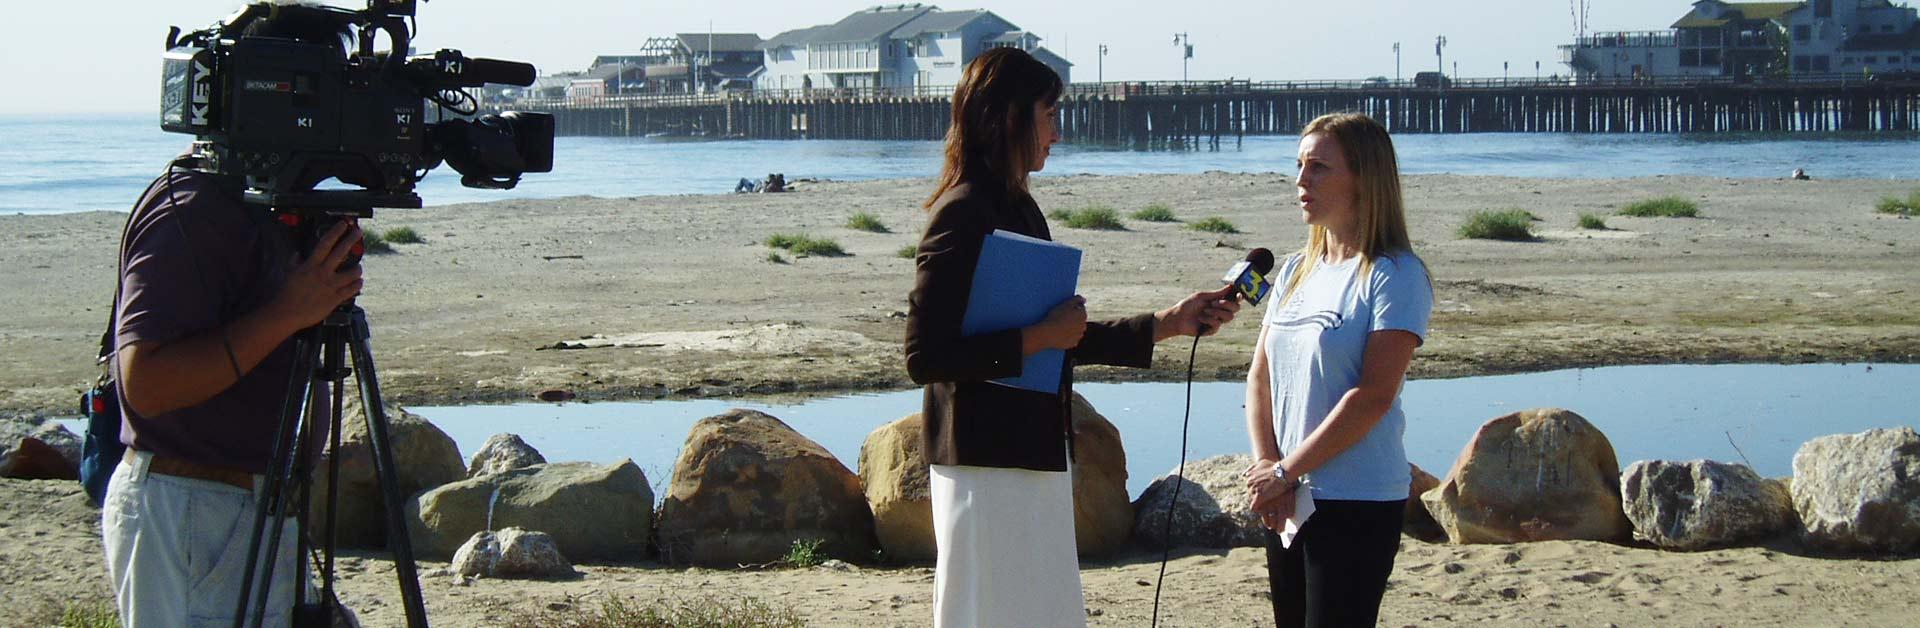 Santa Barbara Channelkeeper's Kira Redmond being interviewed.